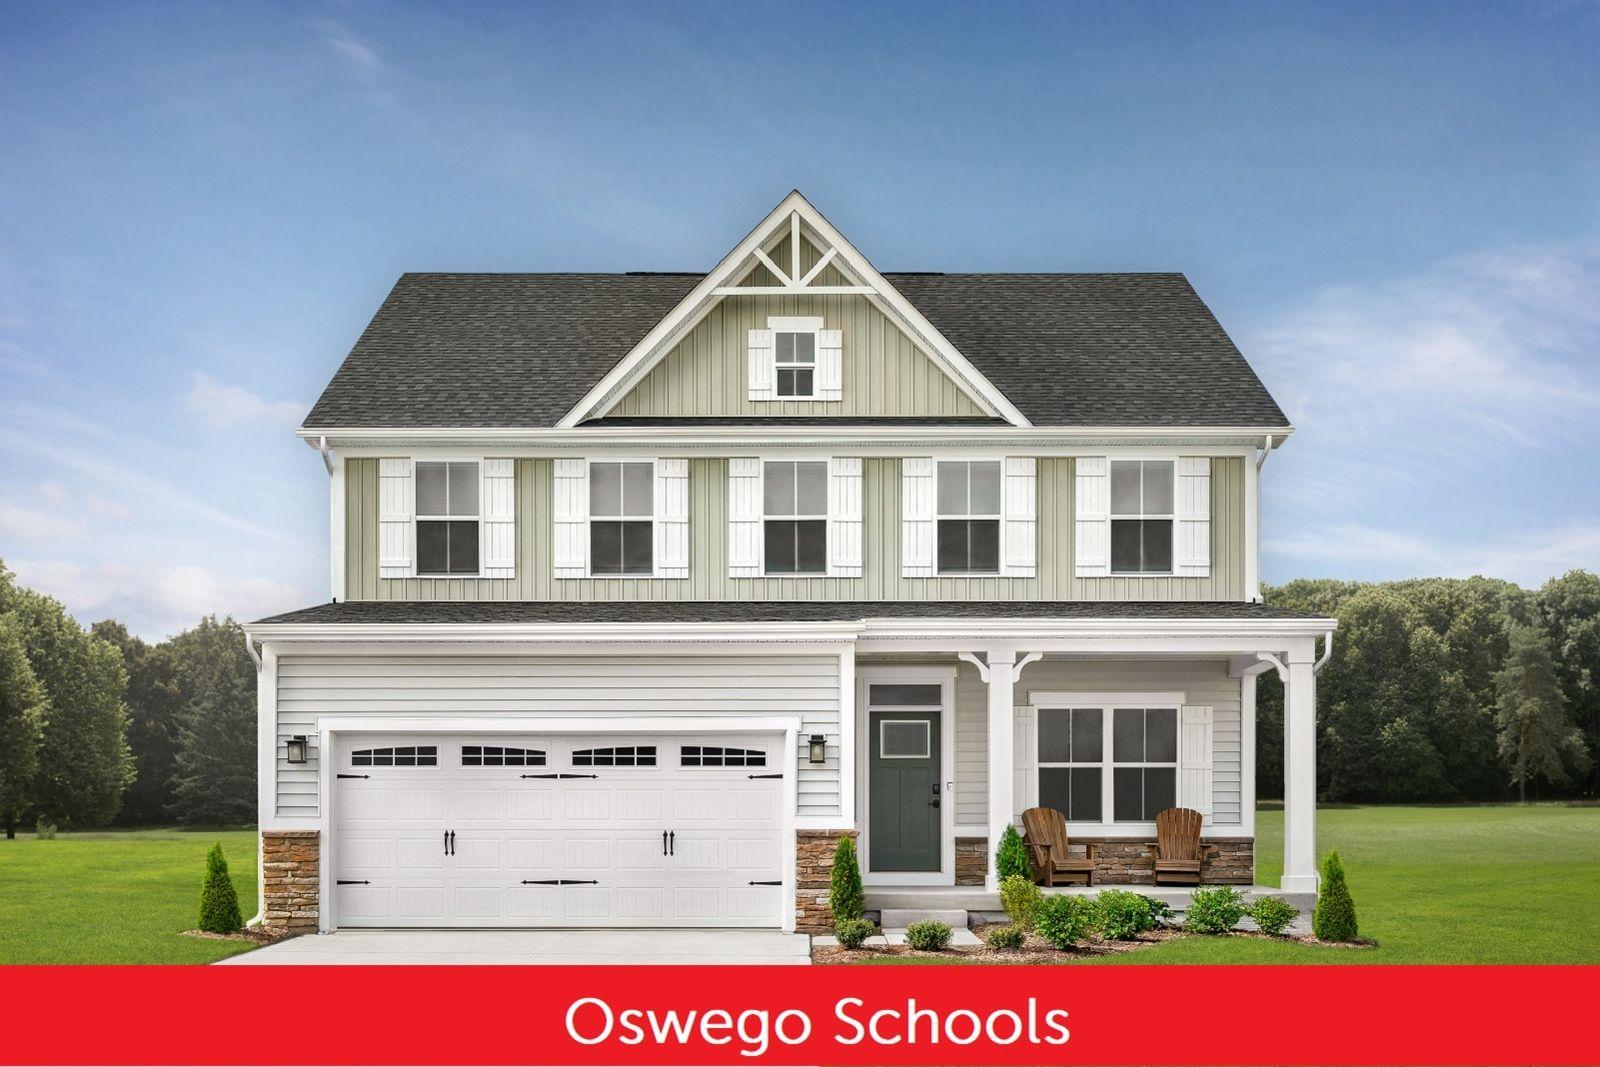 New Homes in Oswego Schools